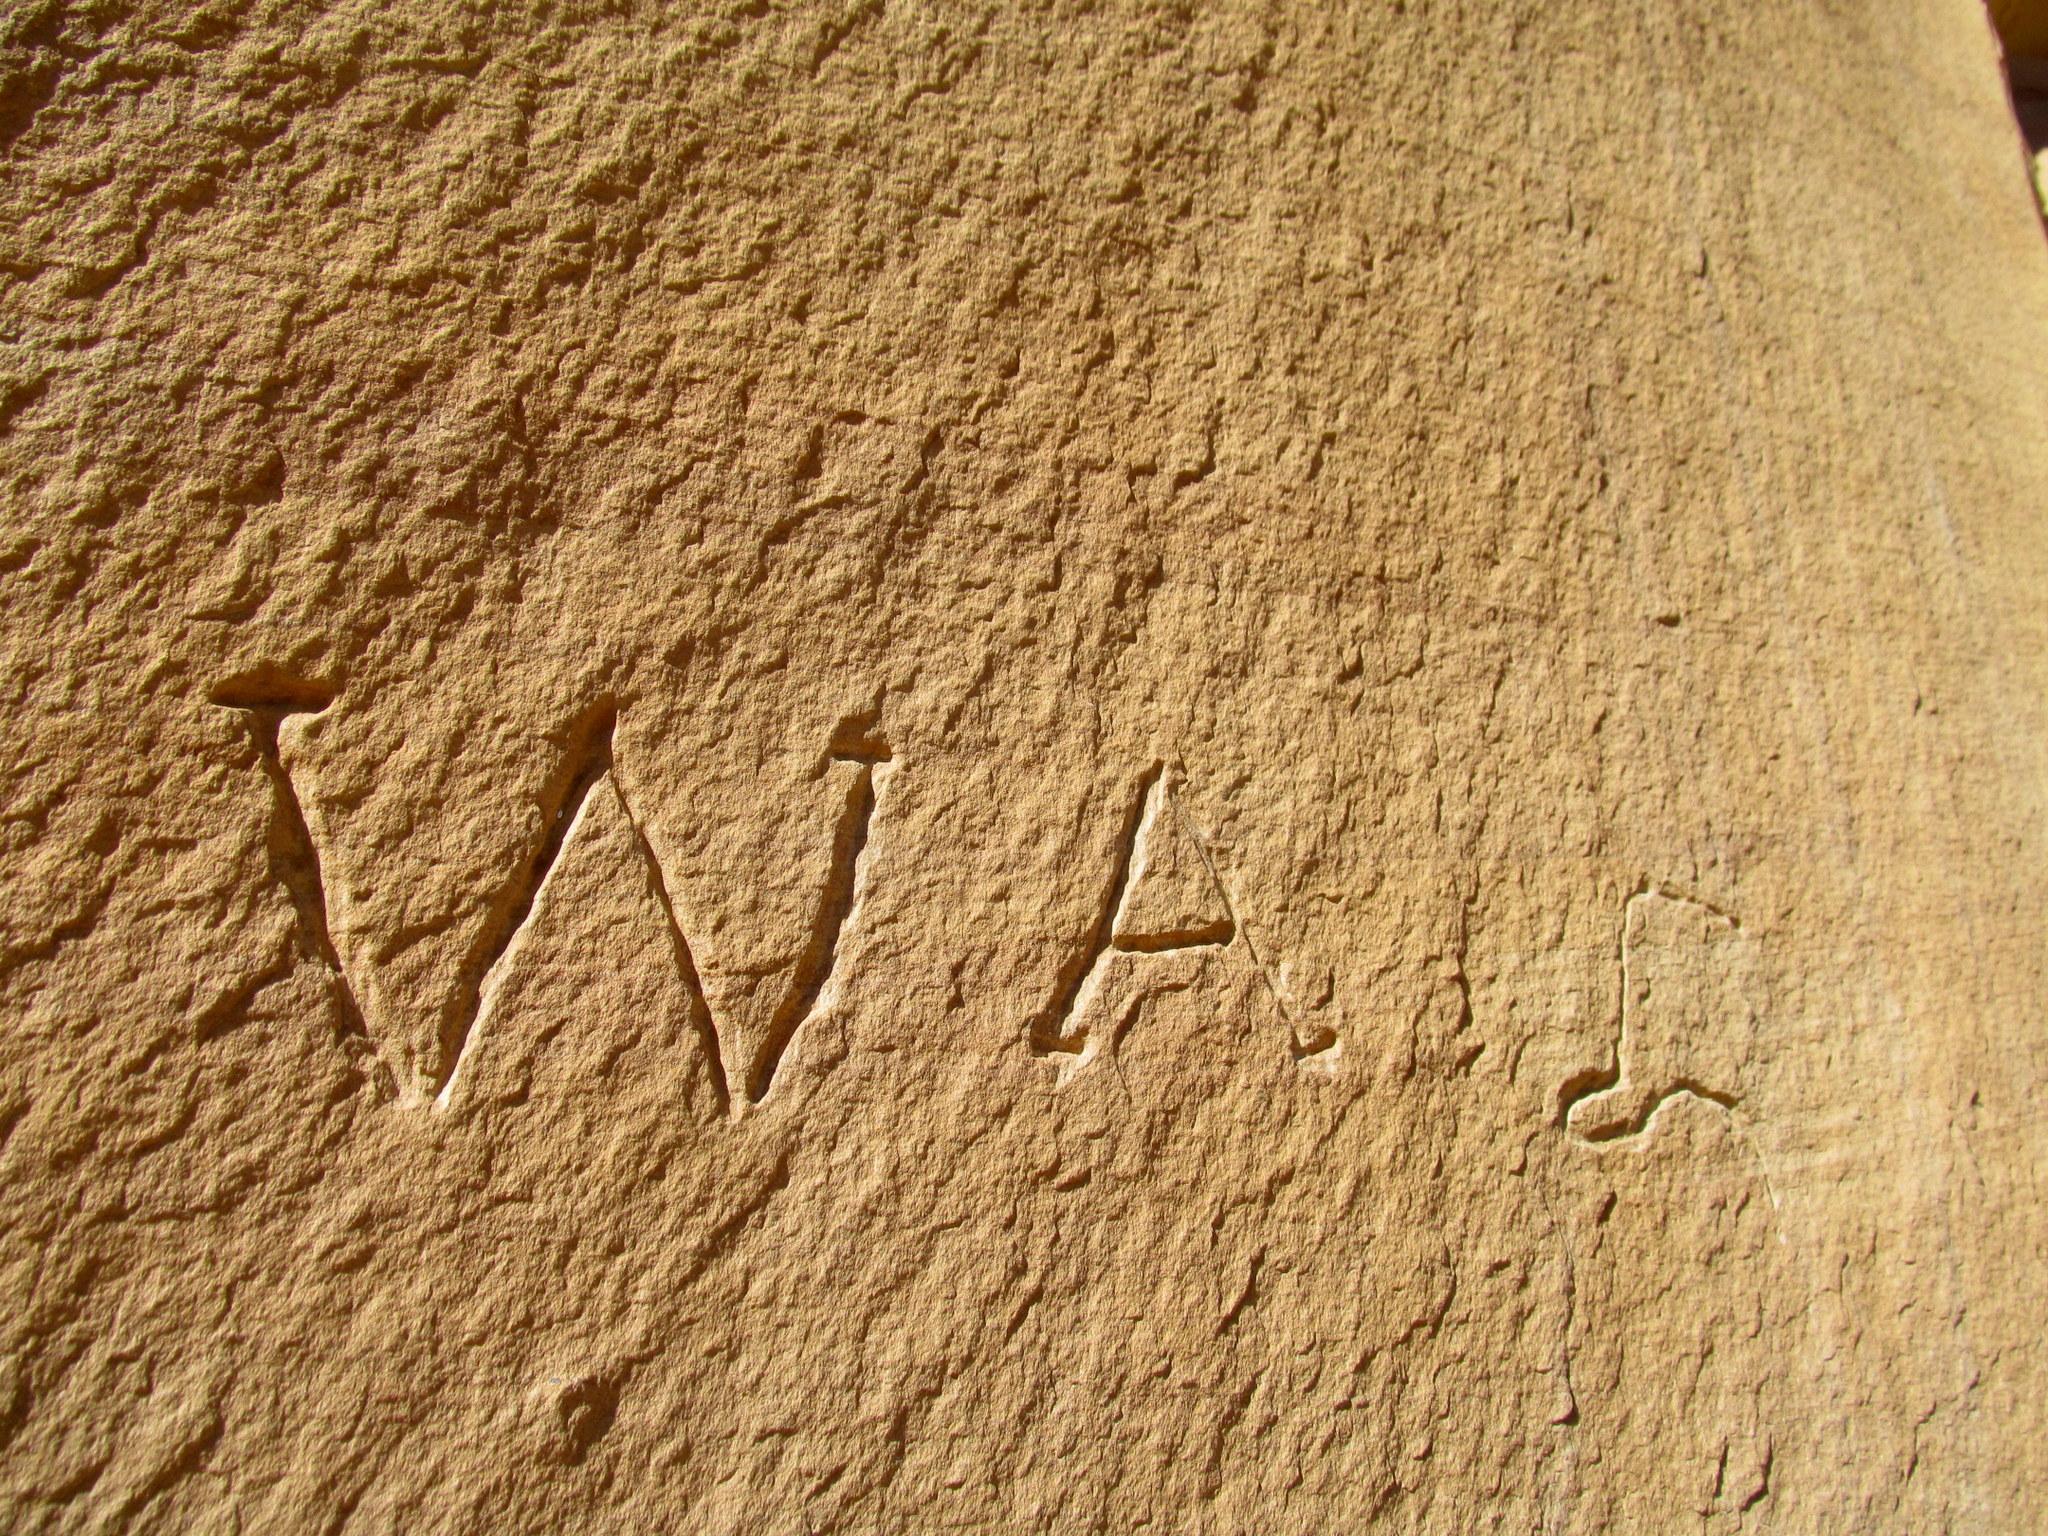 Photo: W.A. inscription